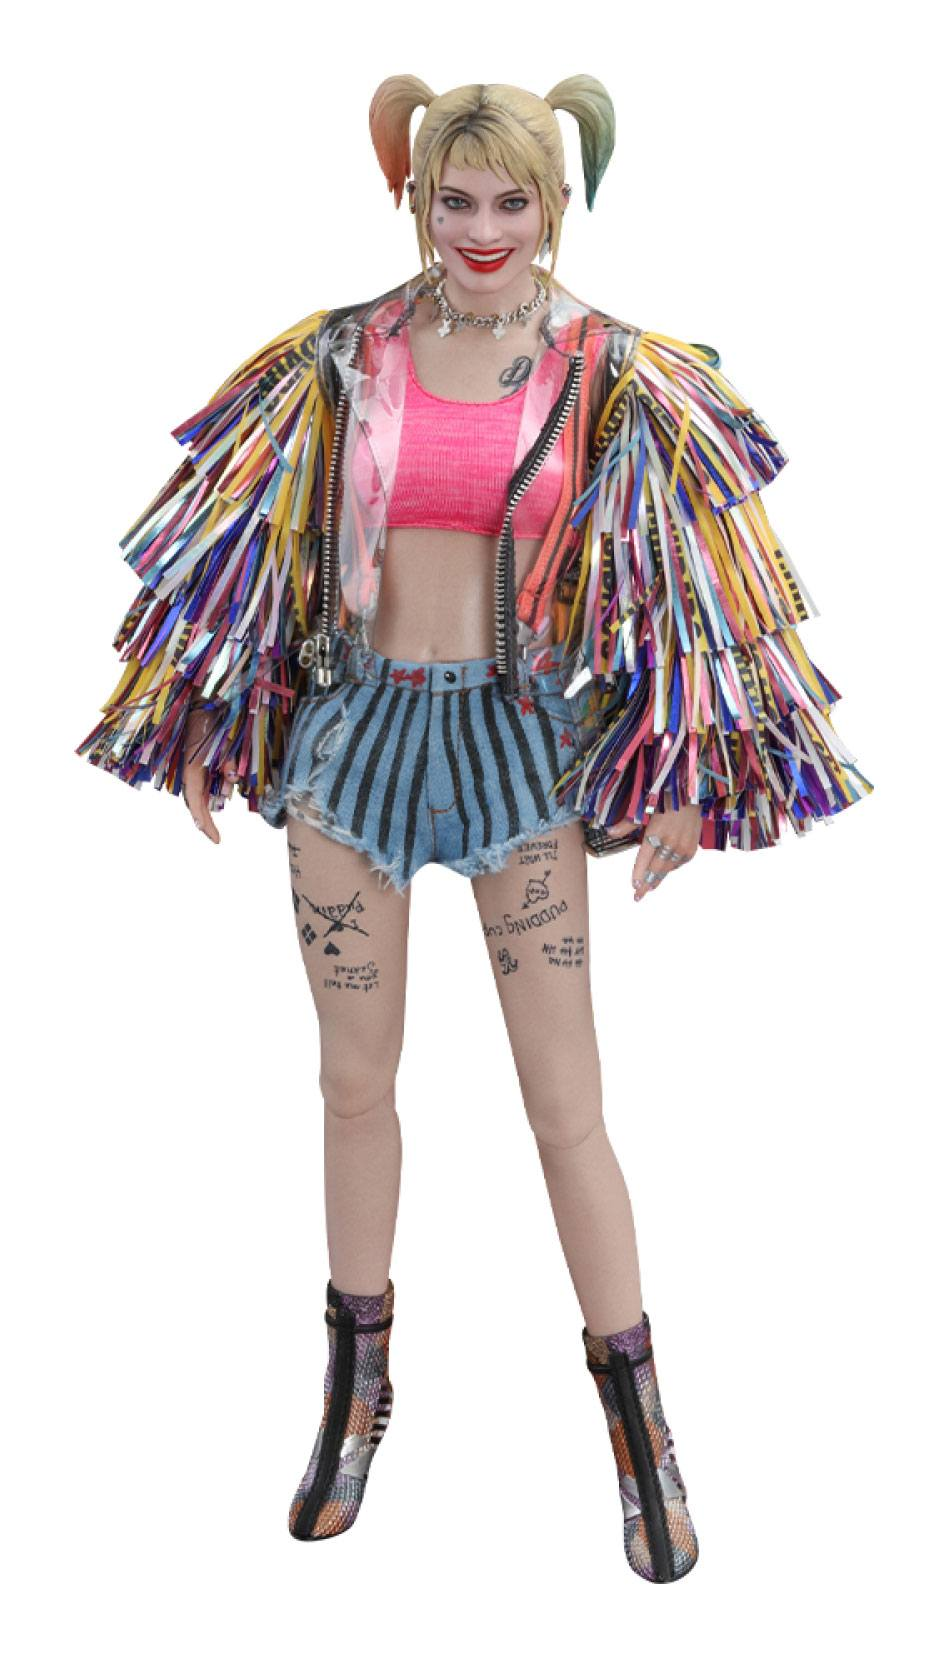 Birds of Prey Movie Masterpiece Action Figure 1/6 Harley Quinn (Caution Tape Jacket Version) 29 cm